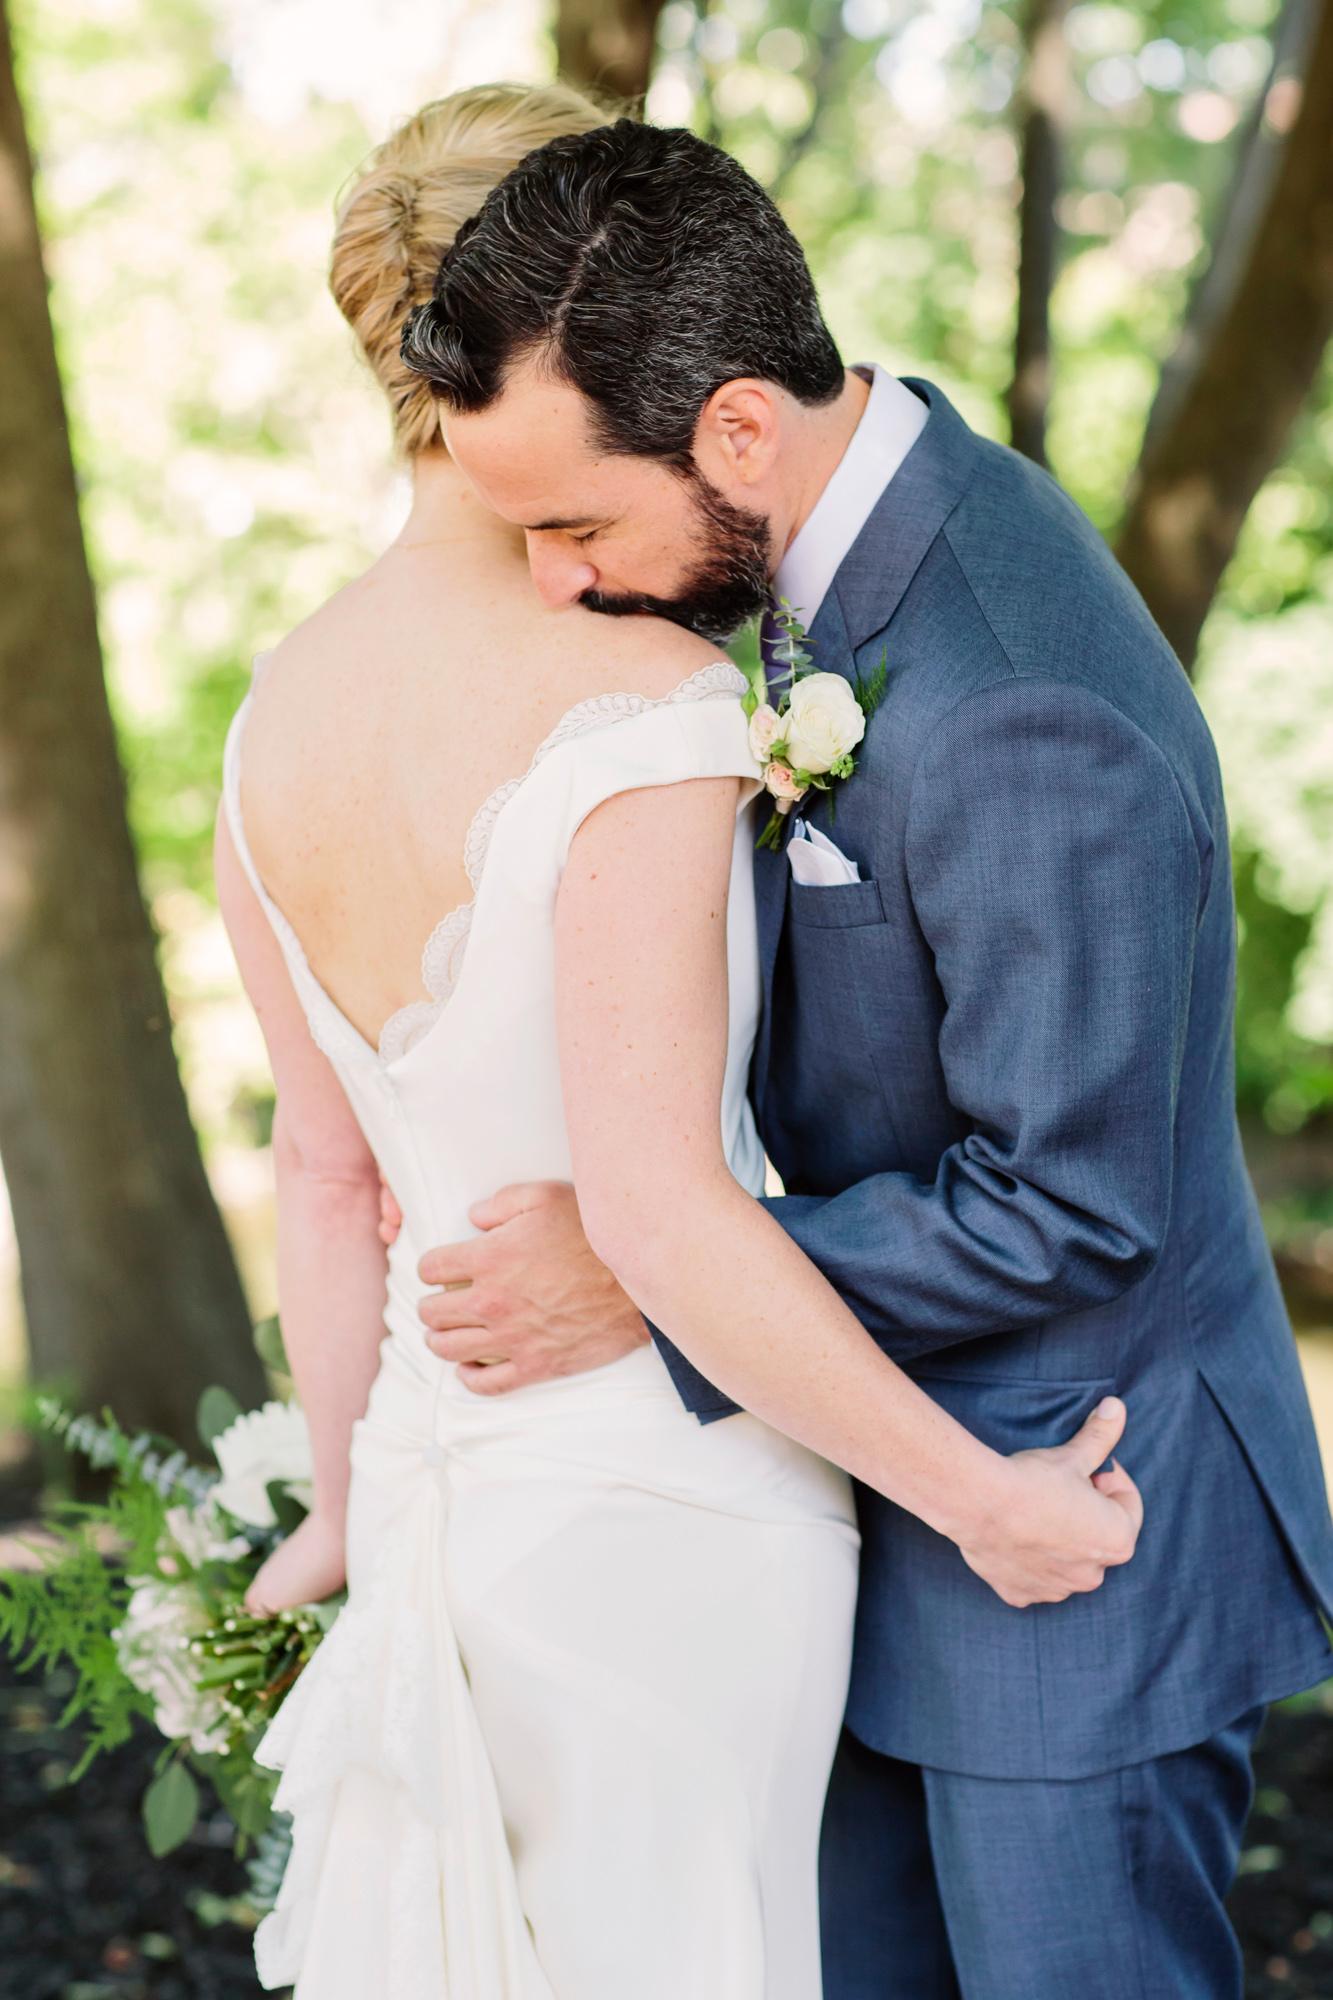 31_Rowan_Brian_The_Roundhouse_Wedding_Beacon_NY_Tanya_Salazar_Photography_208.jpg